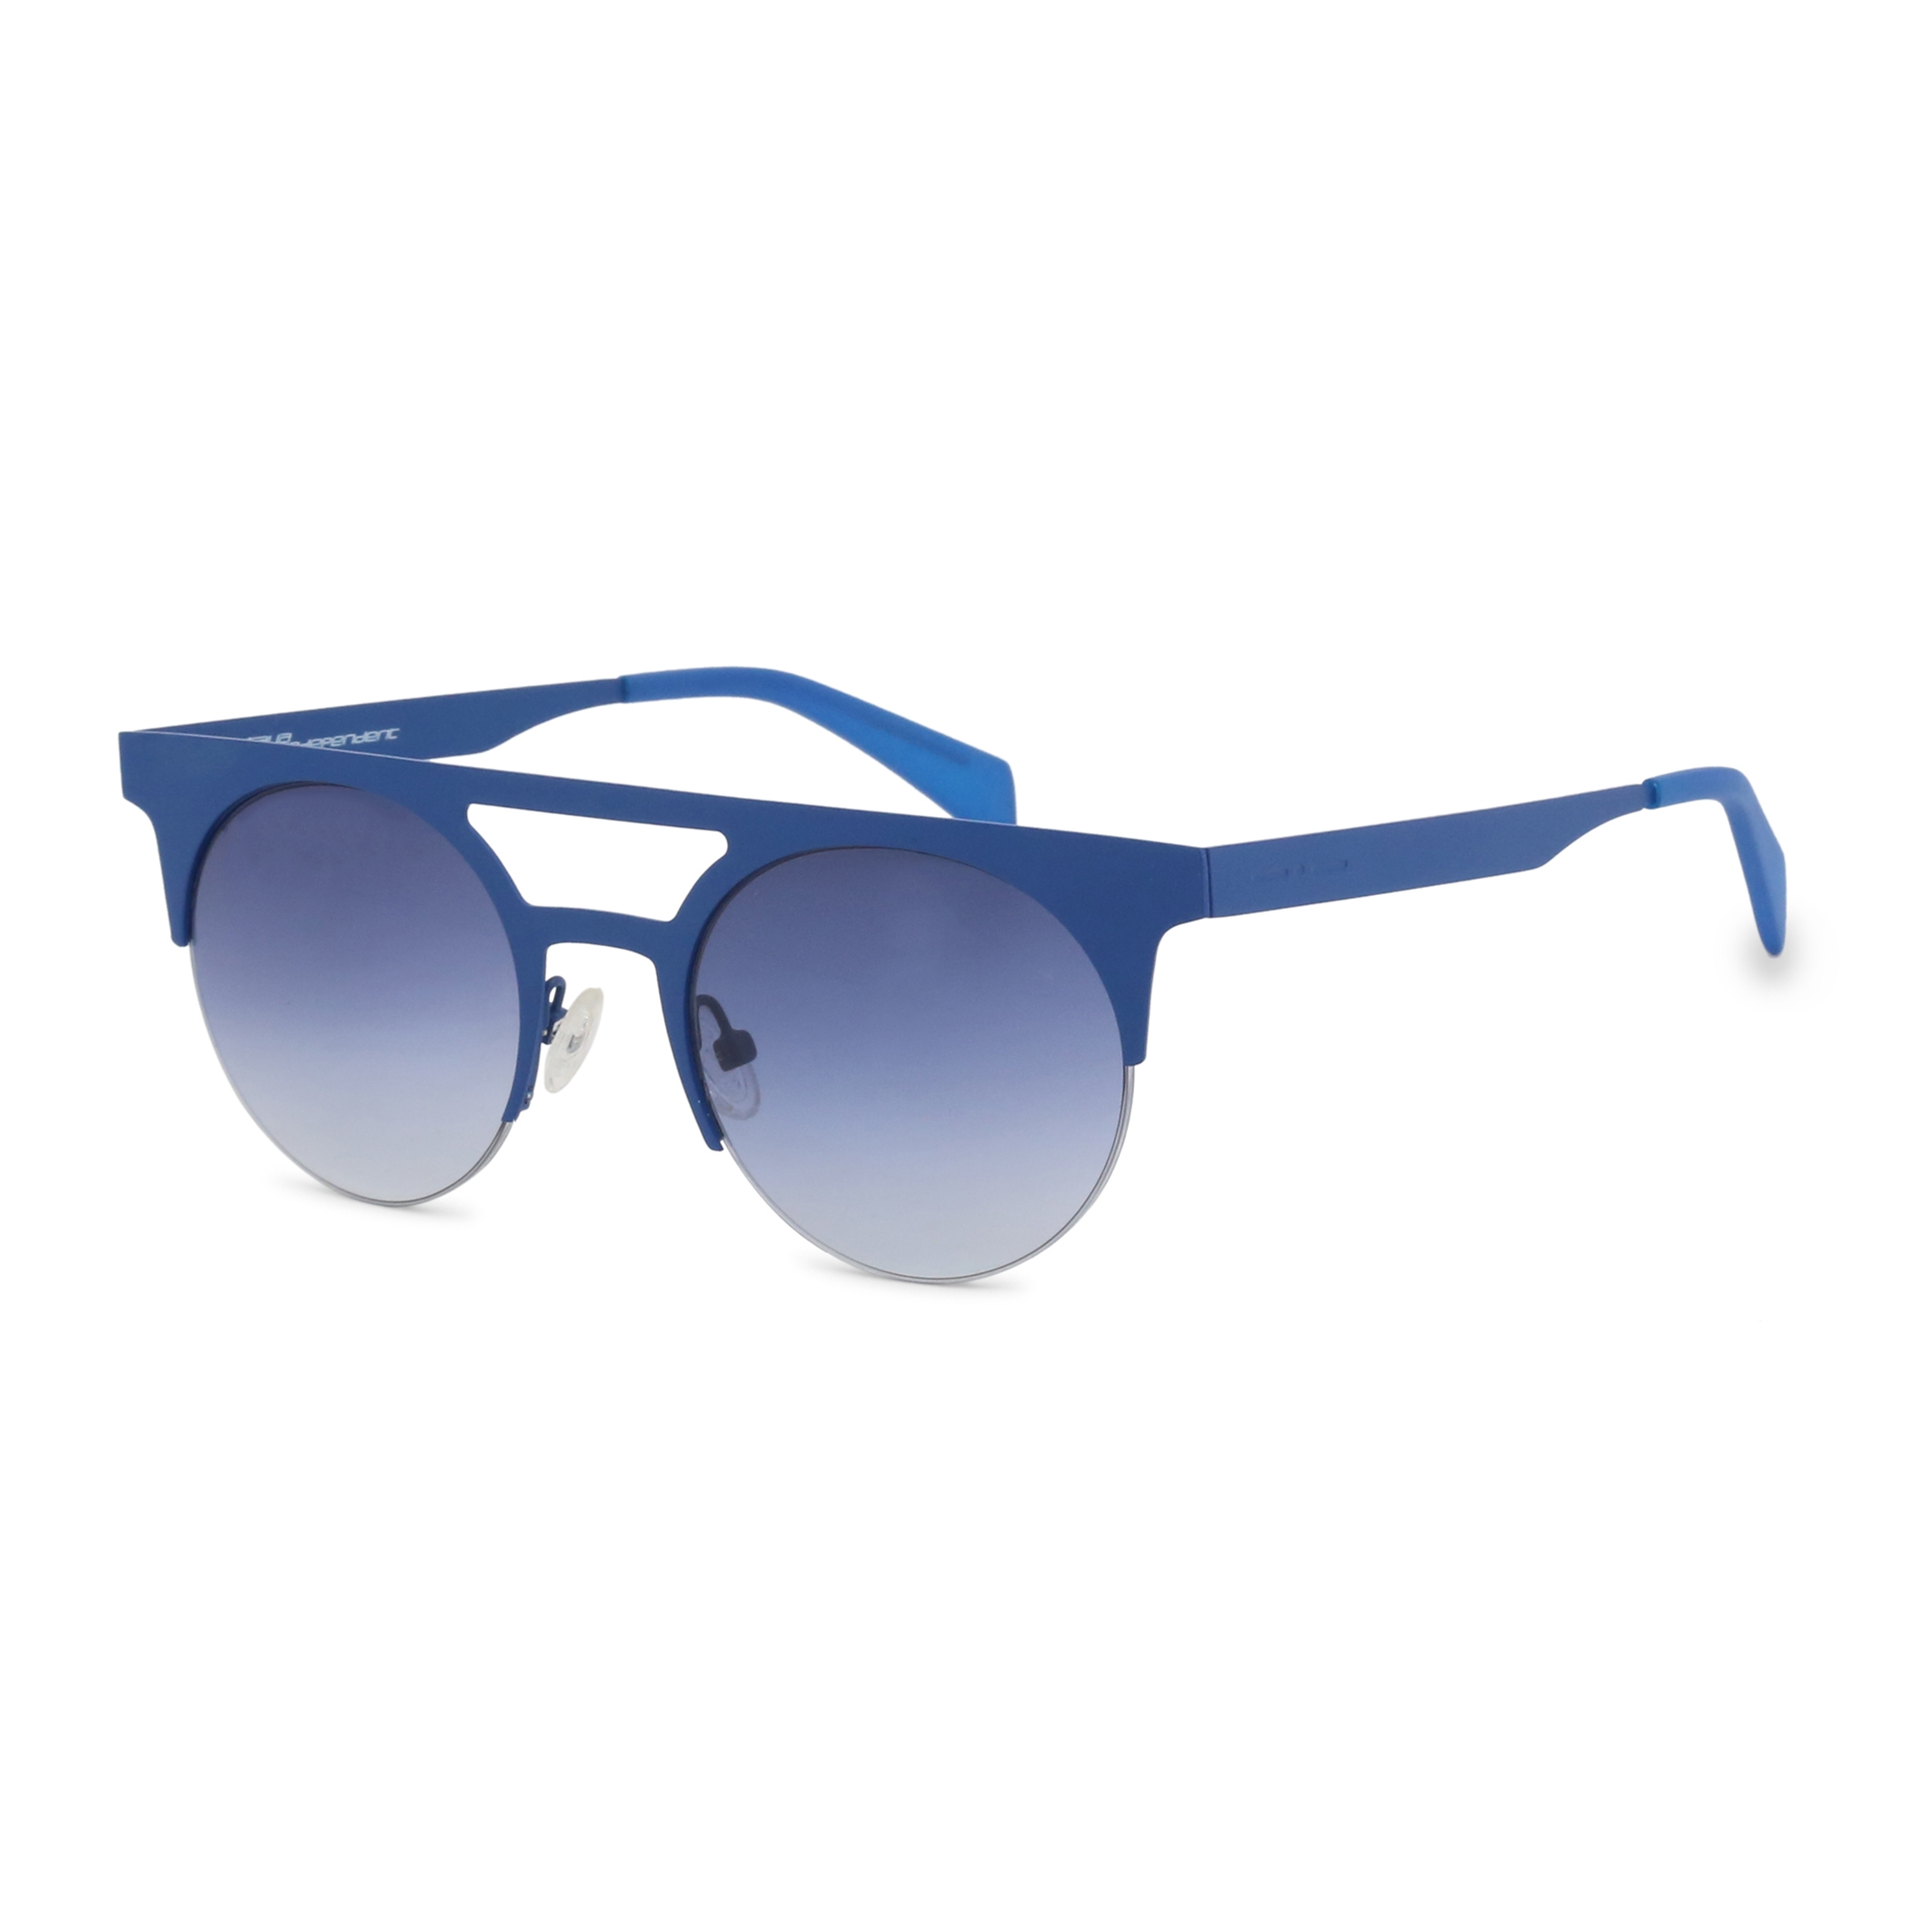 Ochelari de soare Italia Independent 0026 Albastru